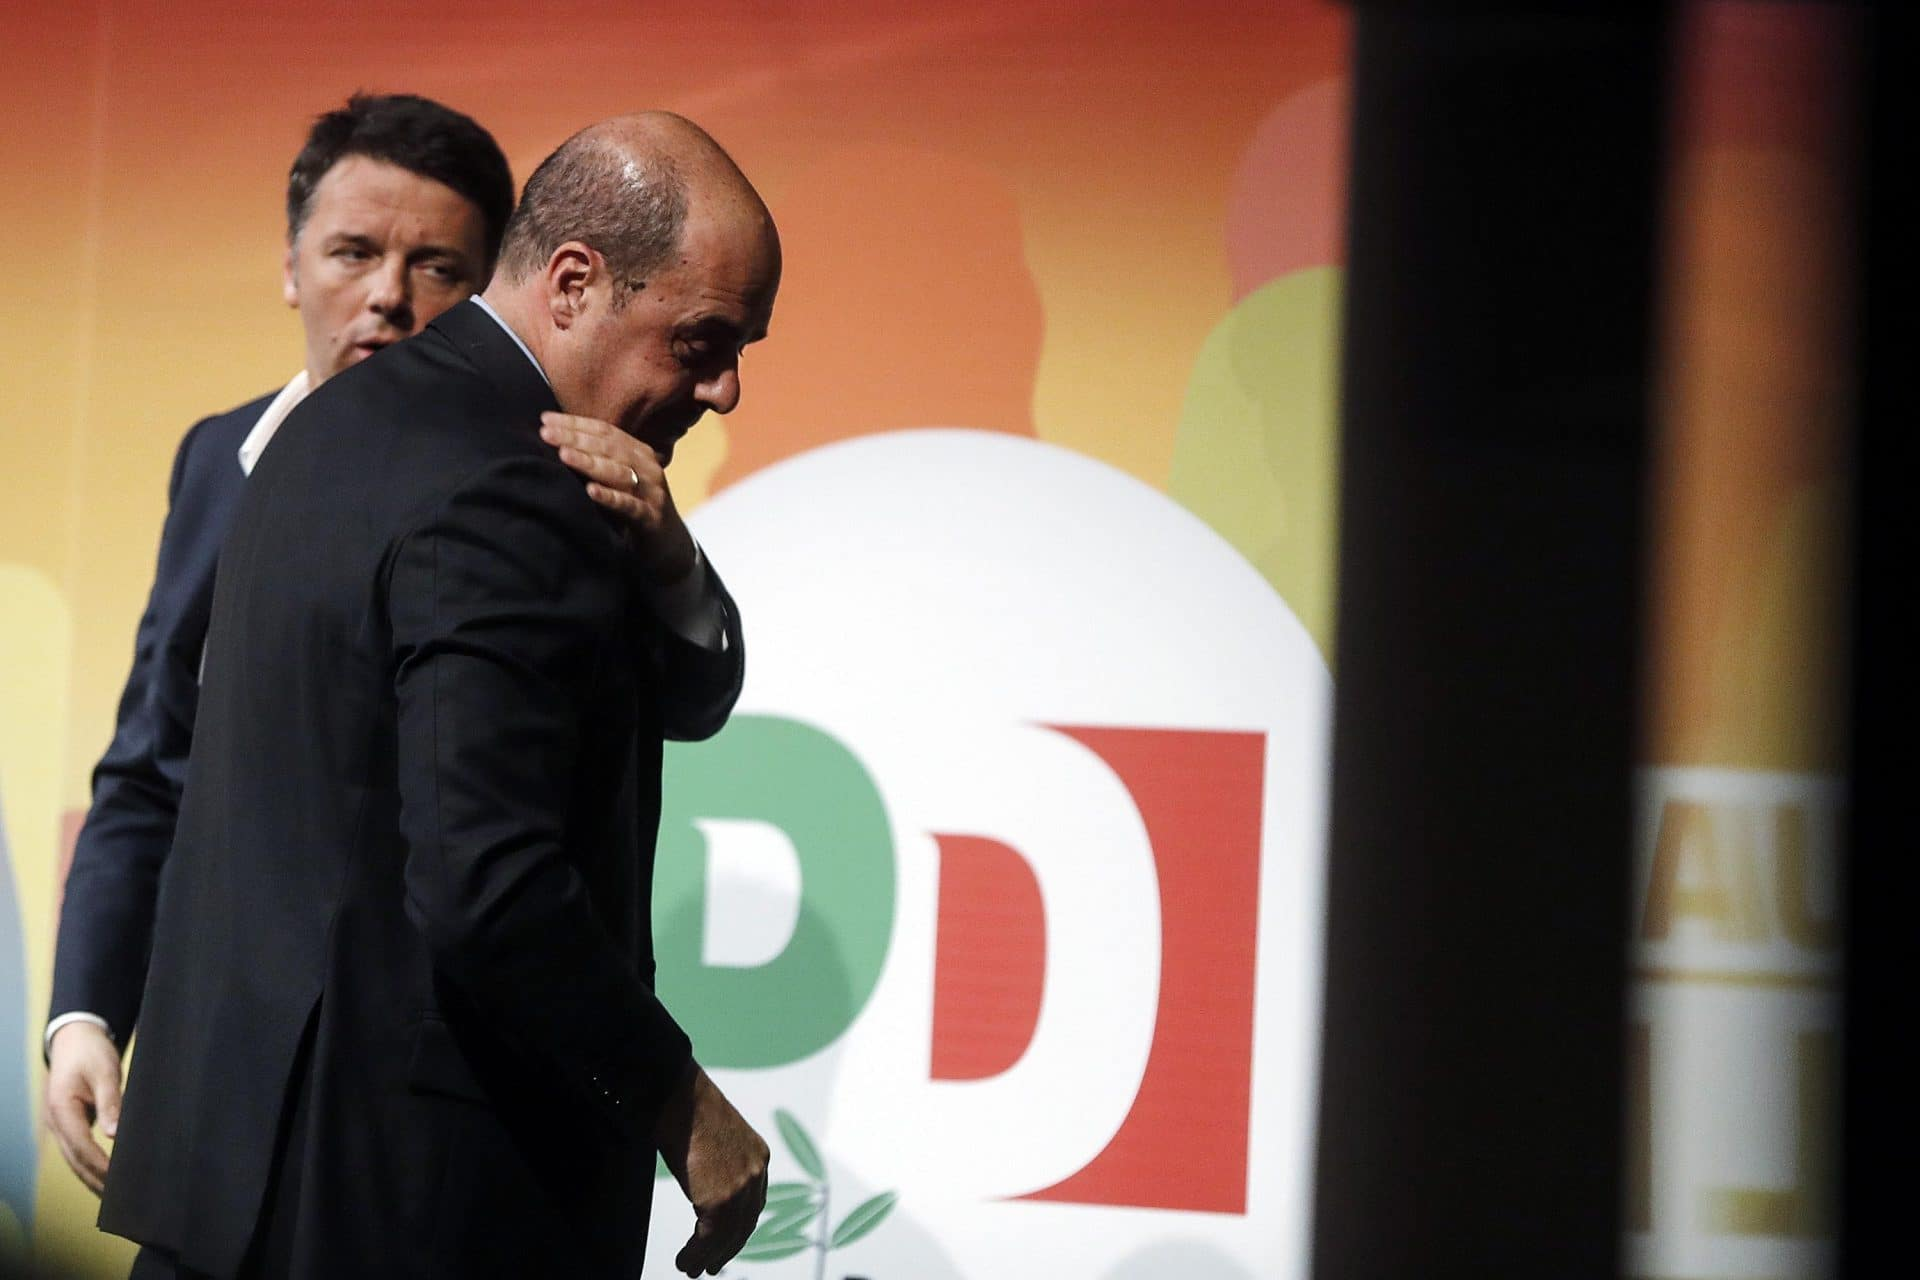 Governo: Renzi, Salvini via, Italia torni protagonista